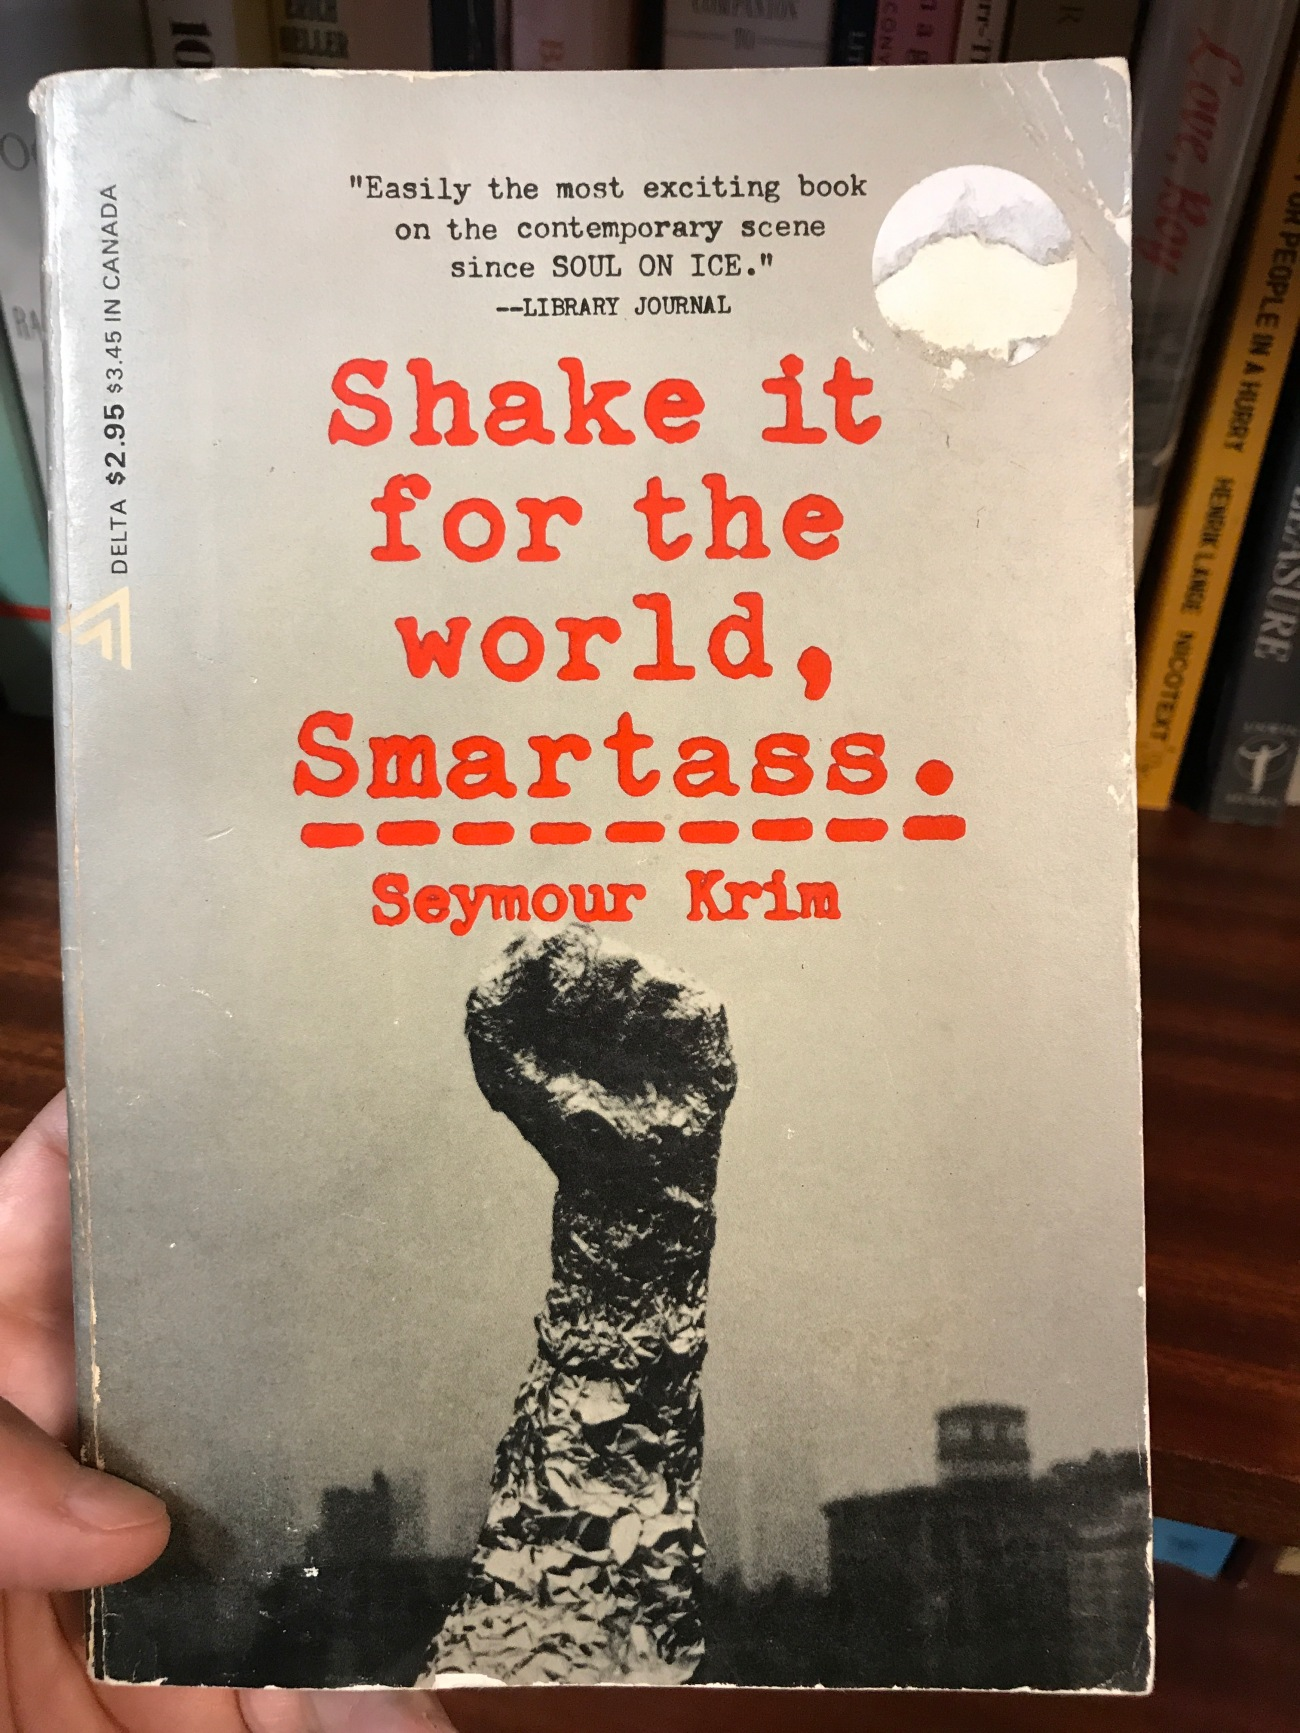 Shake It For the World, Smartass by Seymour Krim (WildmooBooks.com)